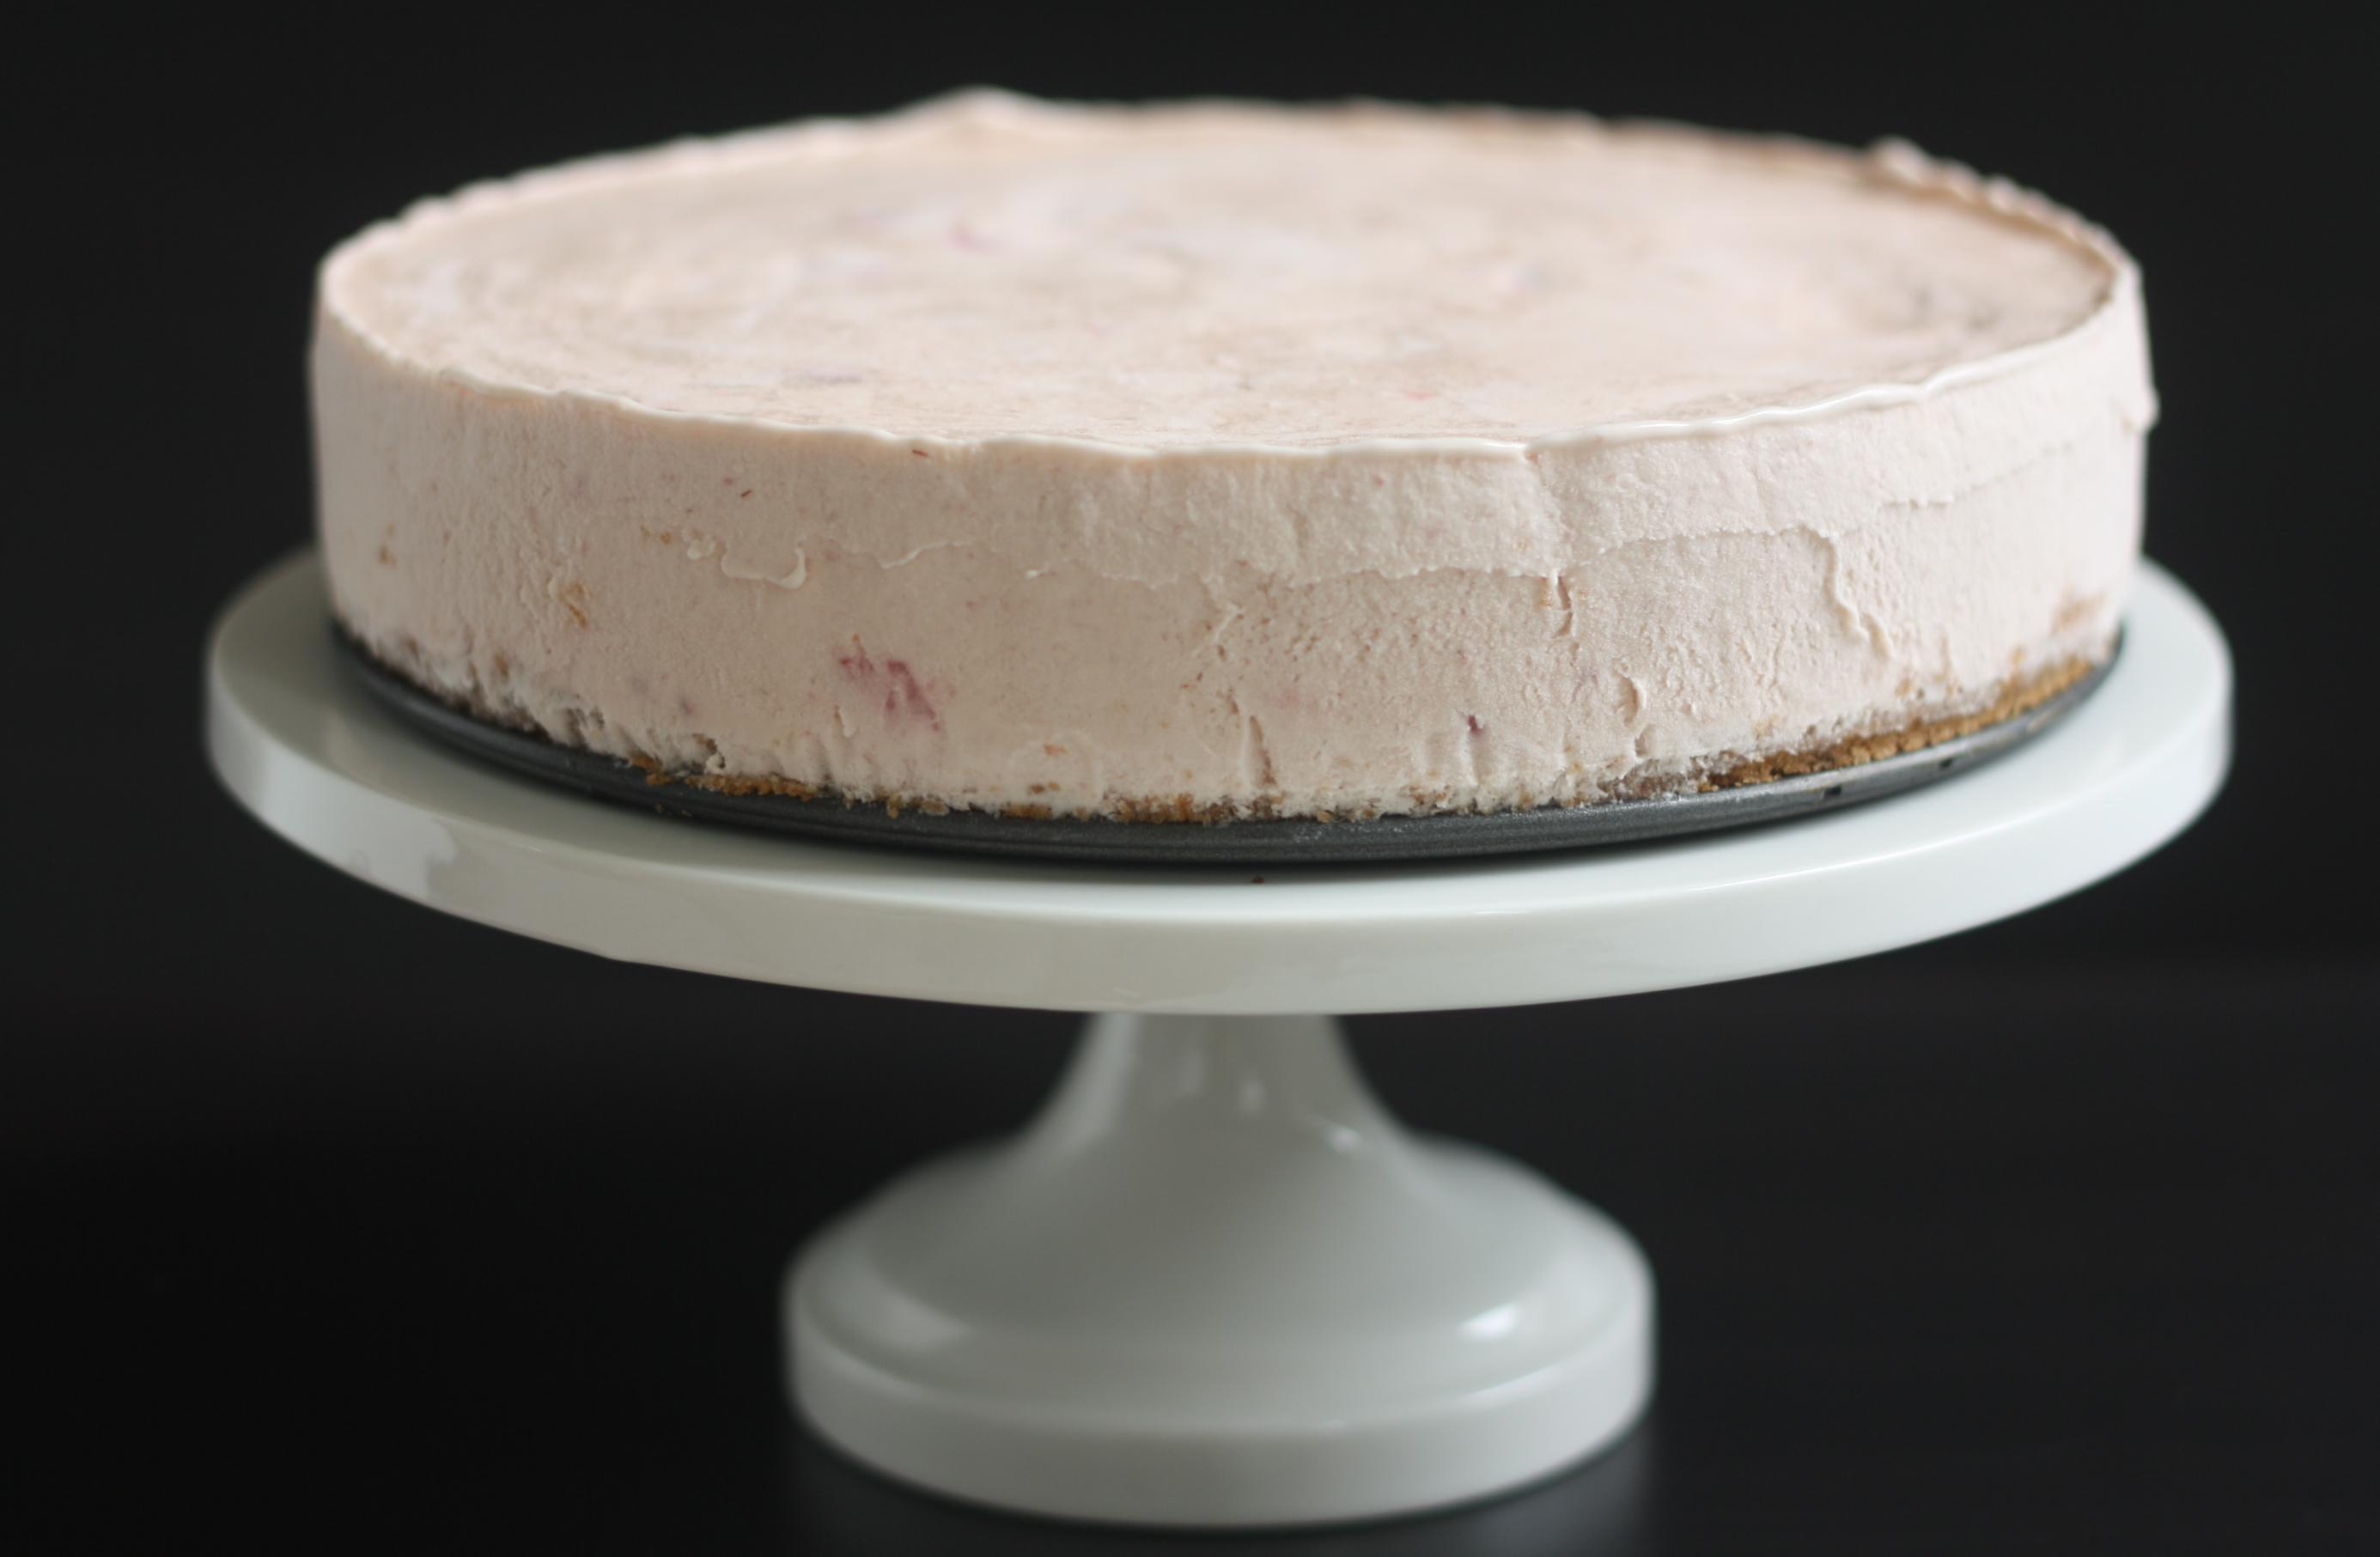 strawberry basil ice cream pie with waffle cone crust